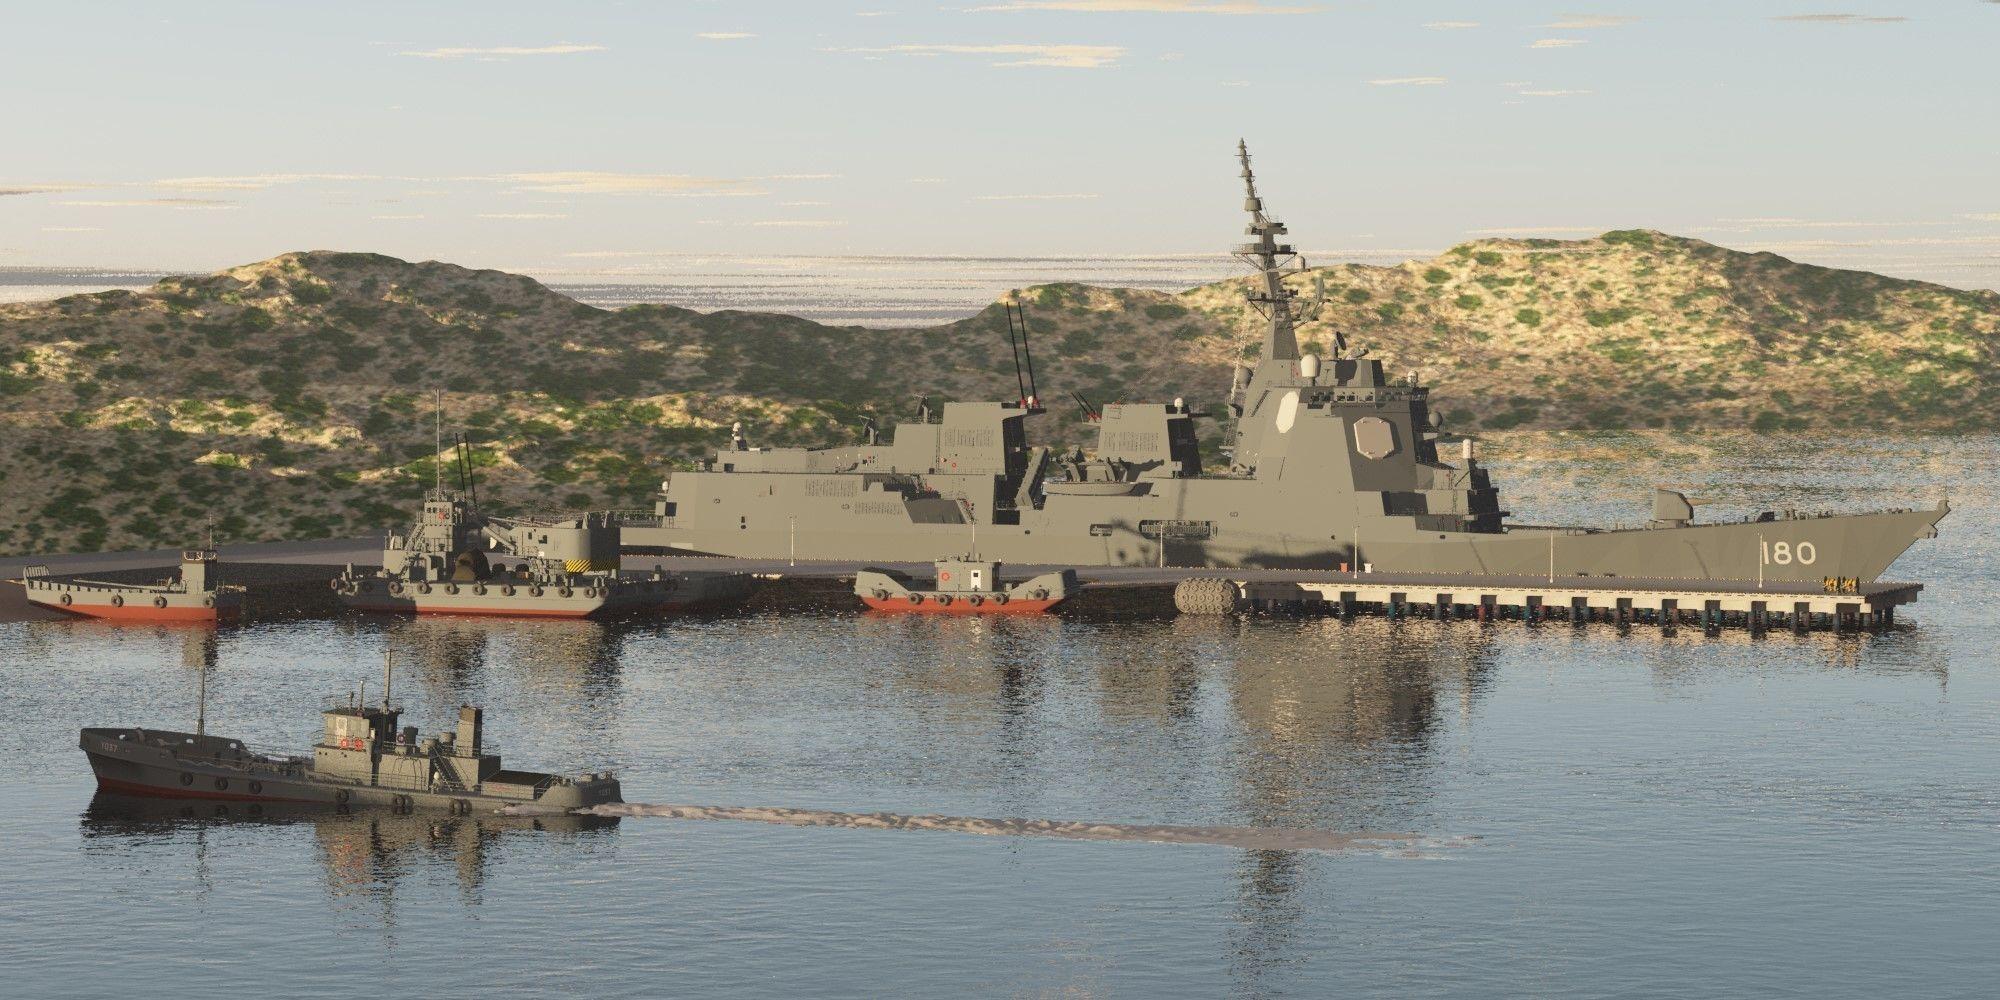 JMSDF DDG-180 HAGURO guided-missile destroyer